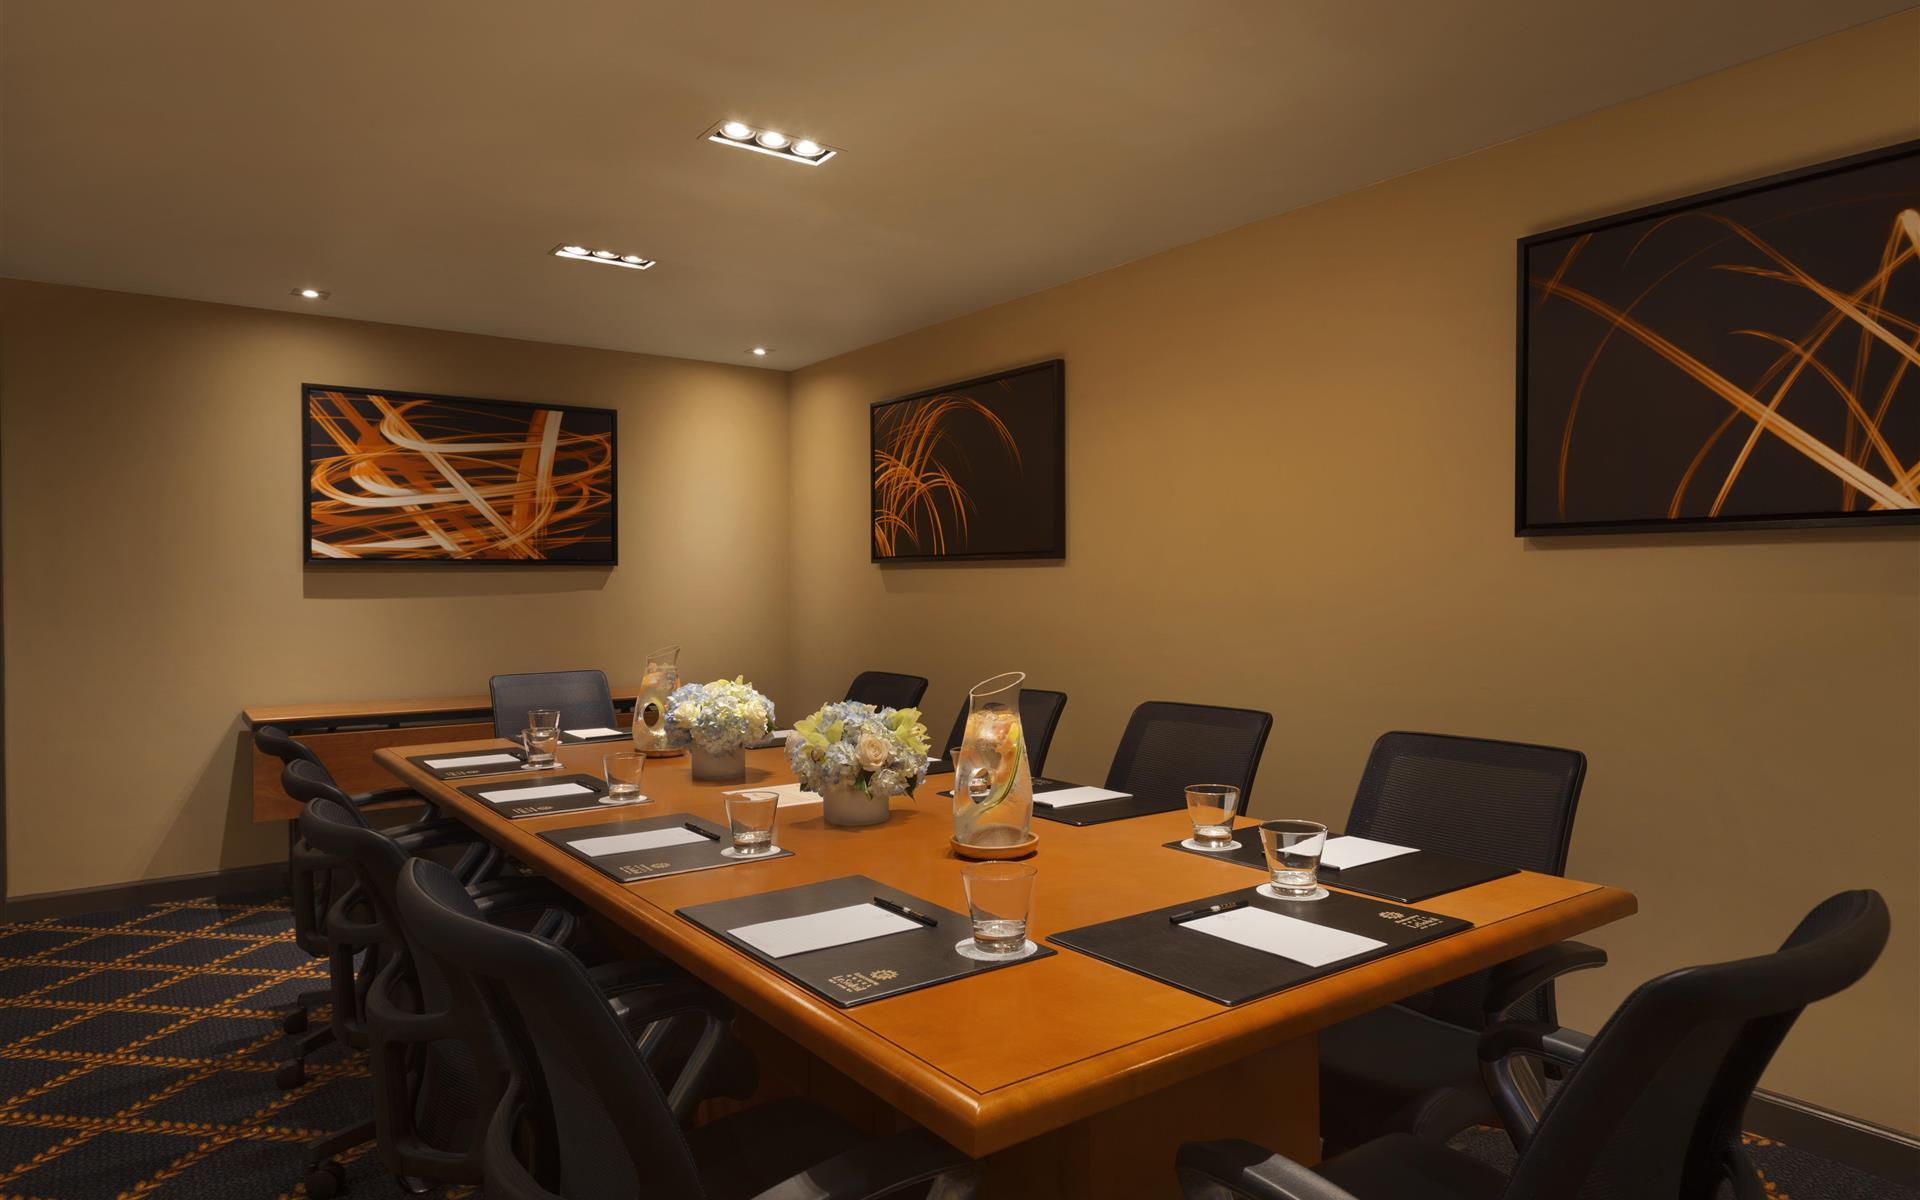 Hotel Le Soleil - Epicurean Board Room